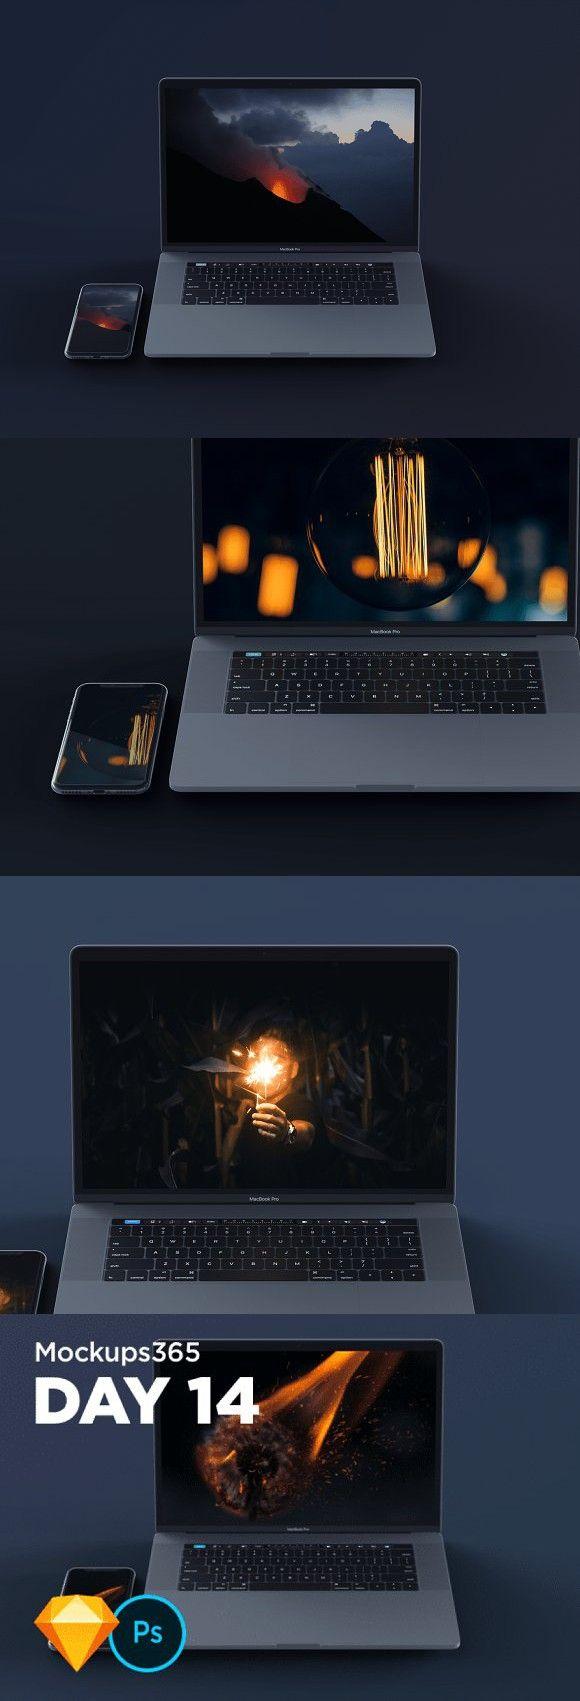 Mockups365 Day 14 Macbook mockup, Mockup design, Sketch